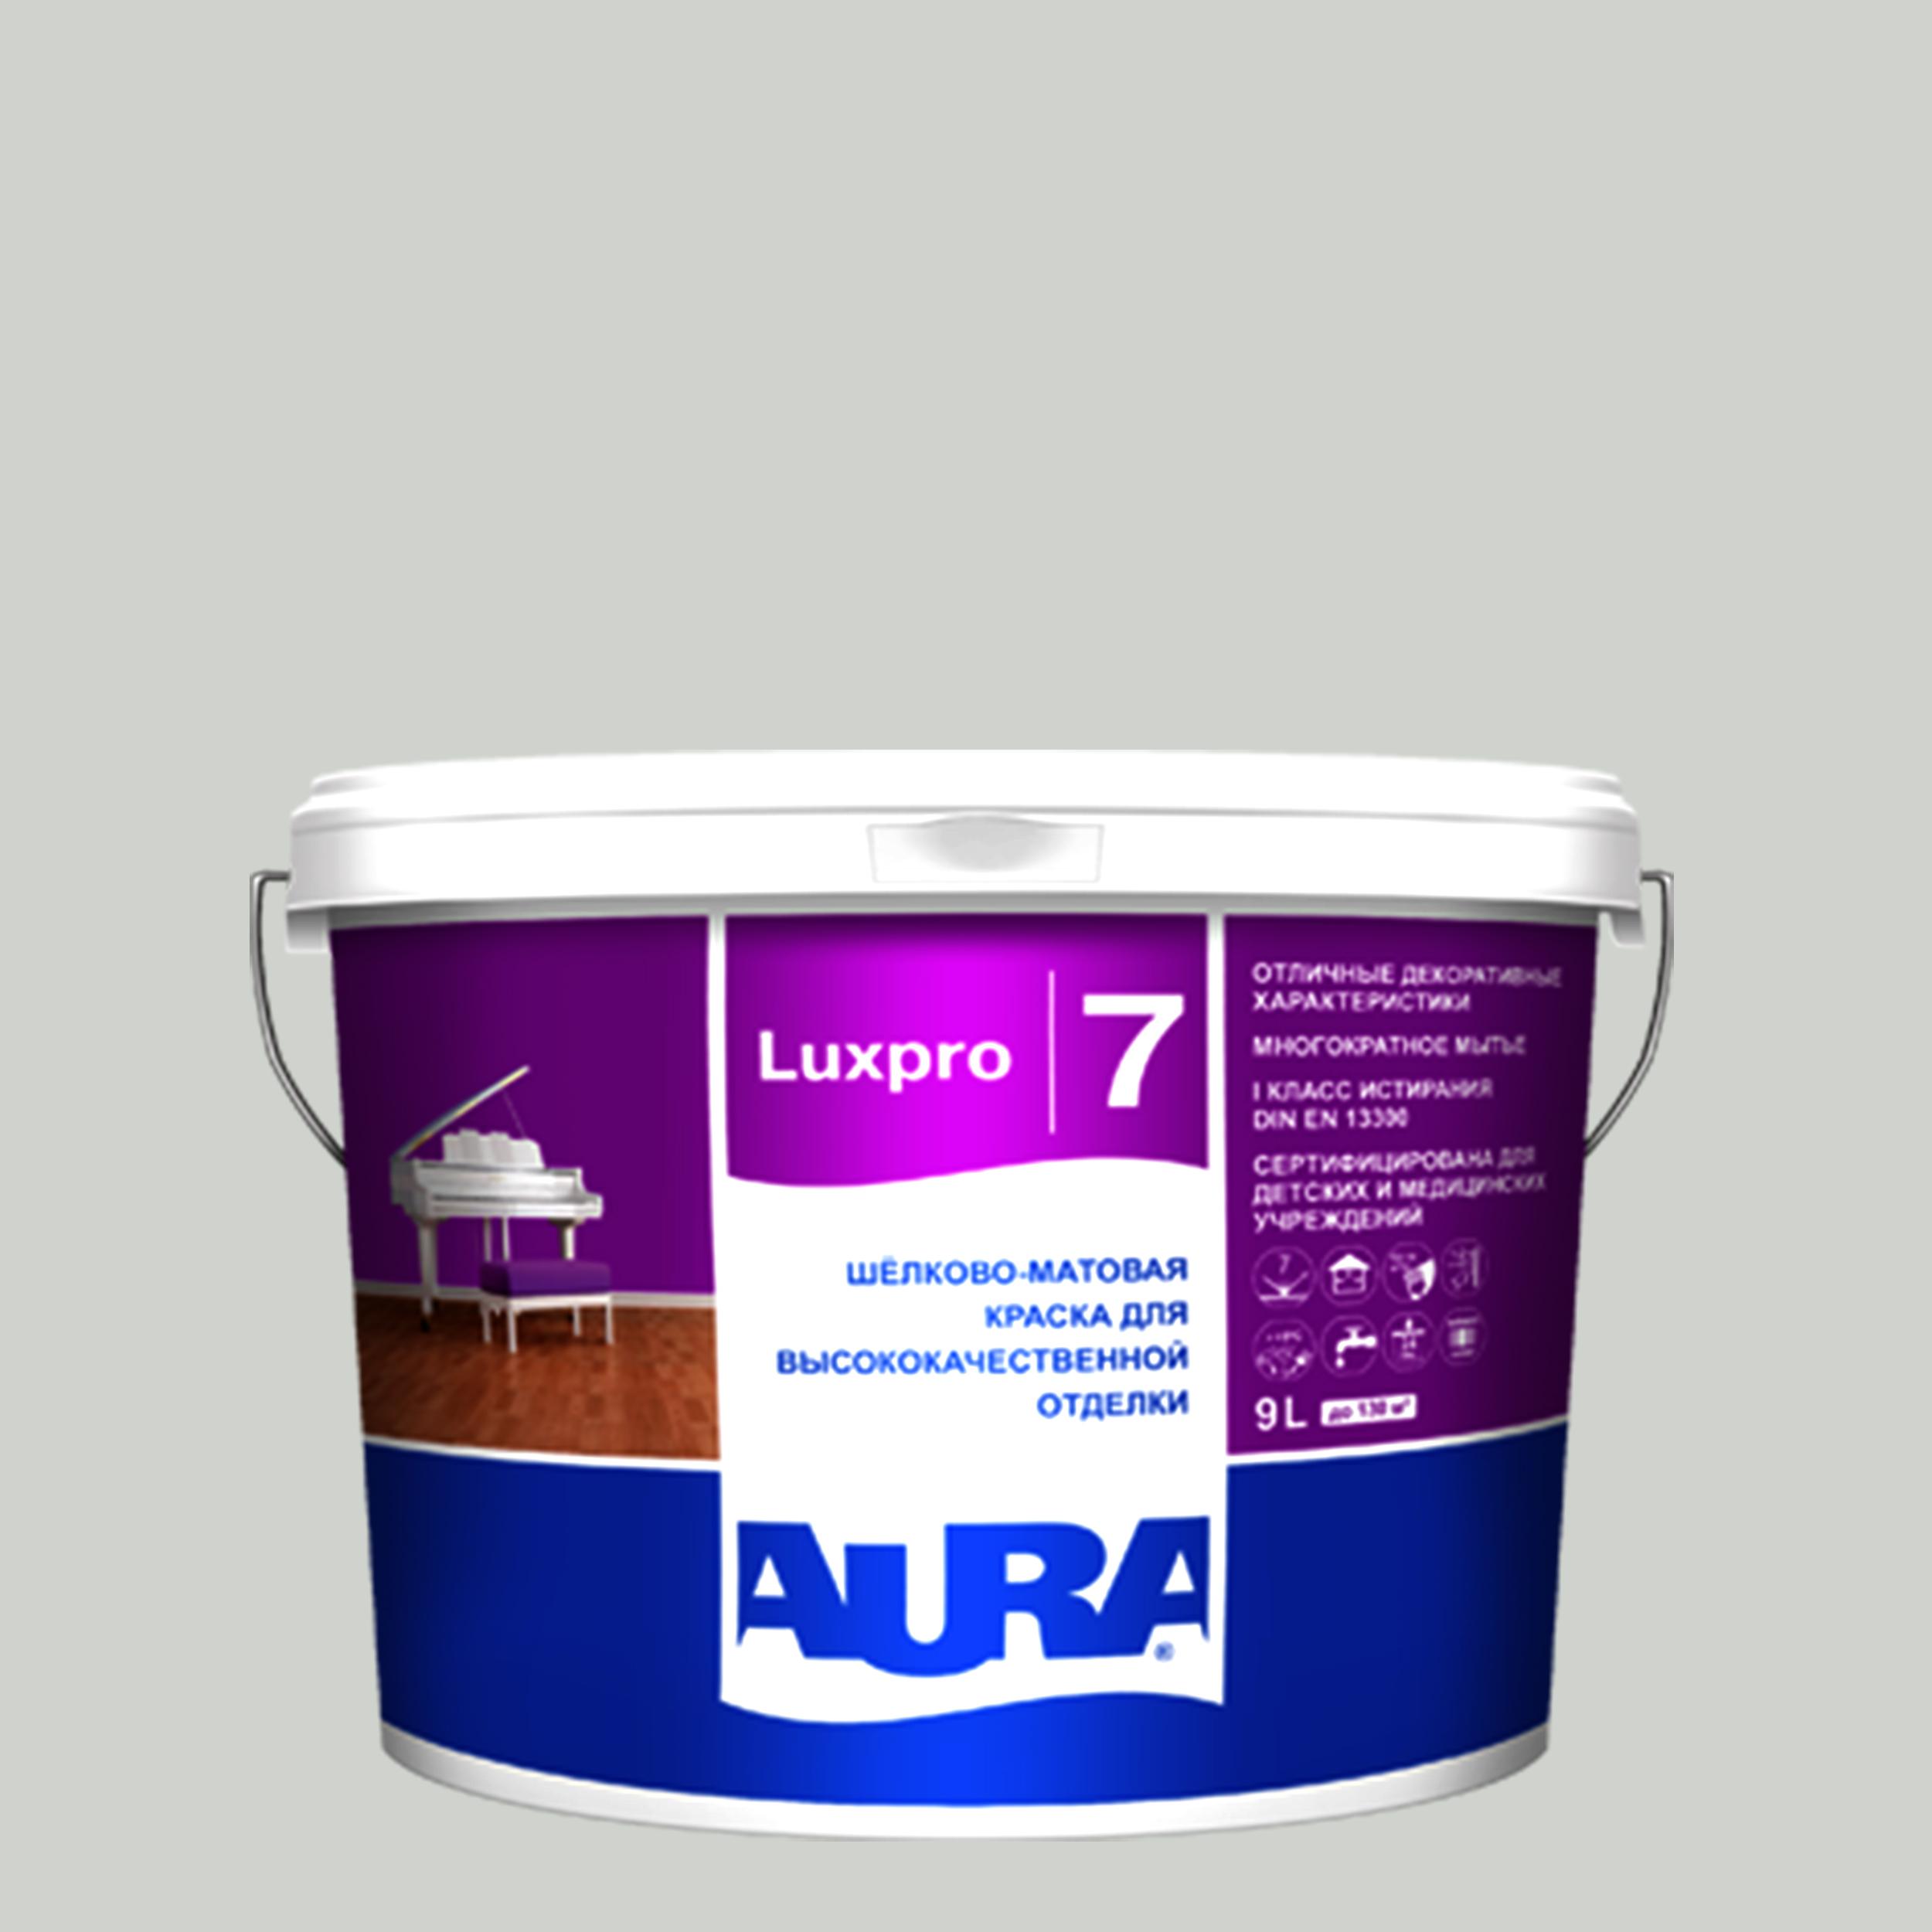 Фото 4 - Краска интерьерная, Aura LuxPRO 7, RAL 9018, 11 кг.